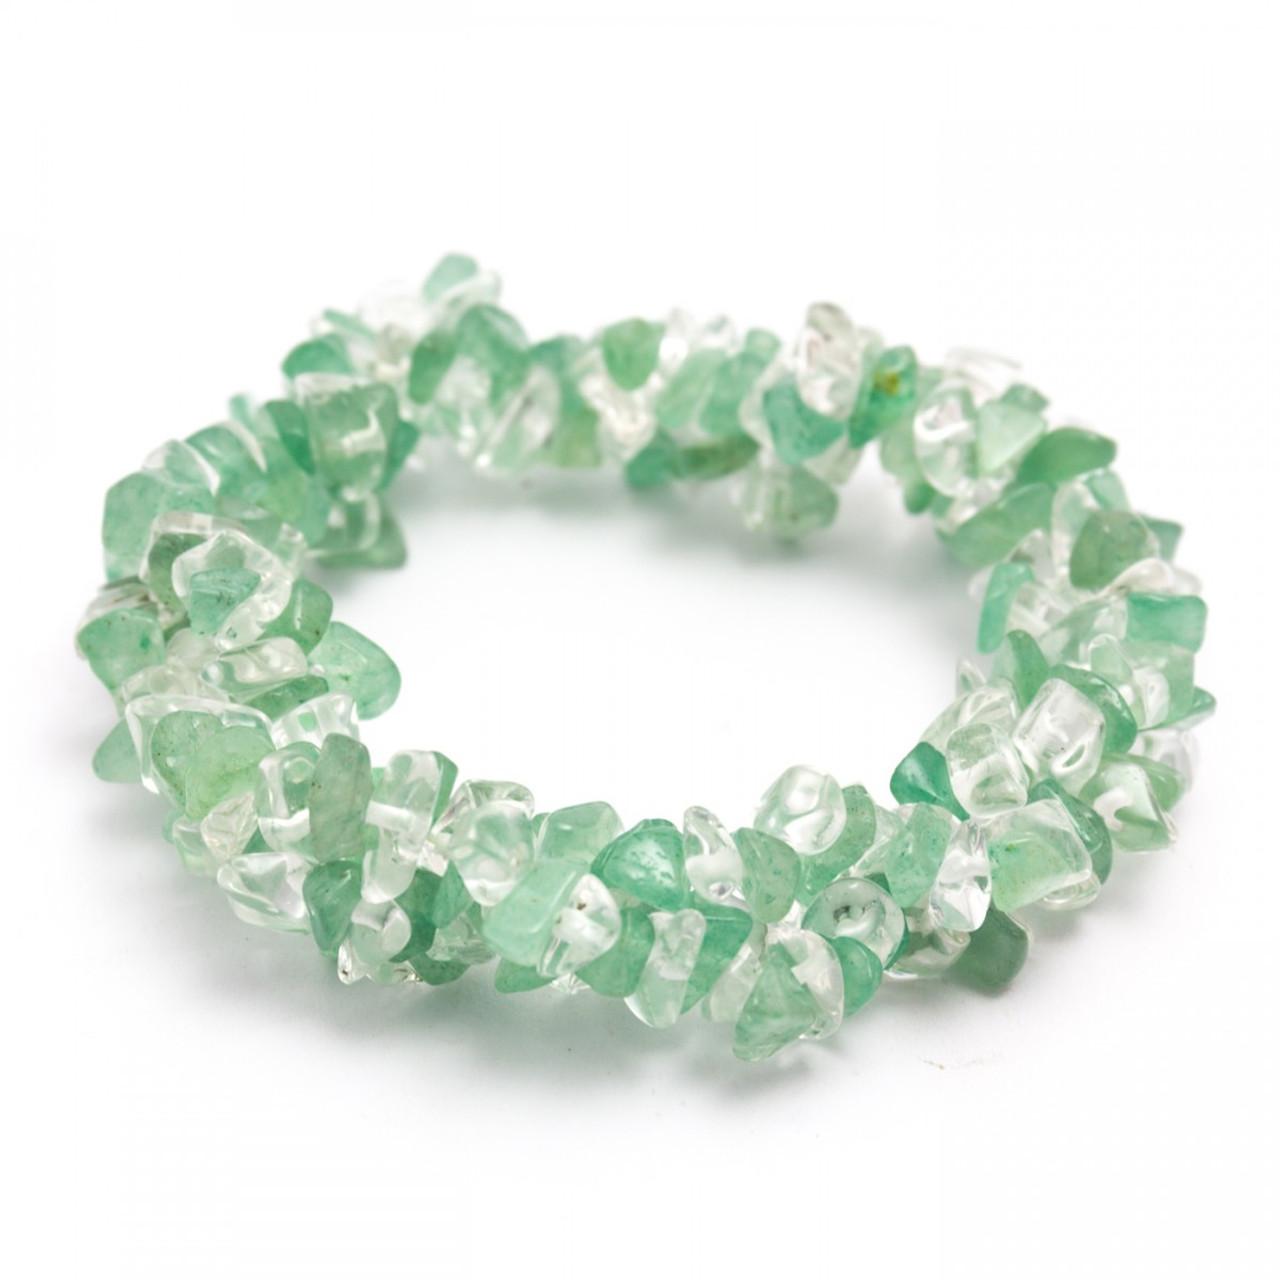 Green Aventurine & Clear Quartz Chunky Chip Bracelet